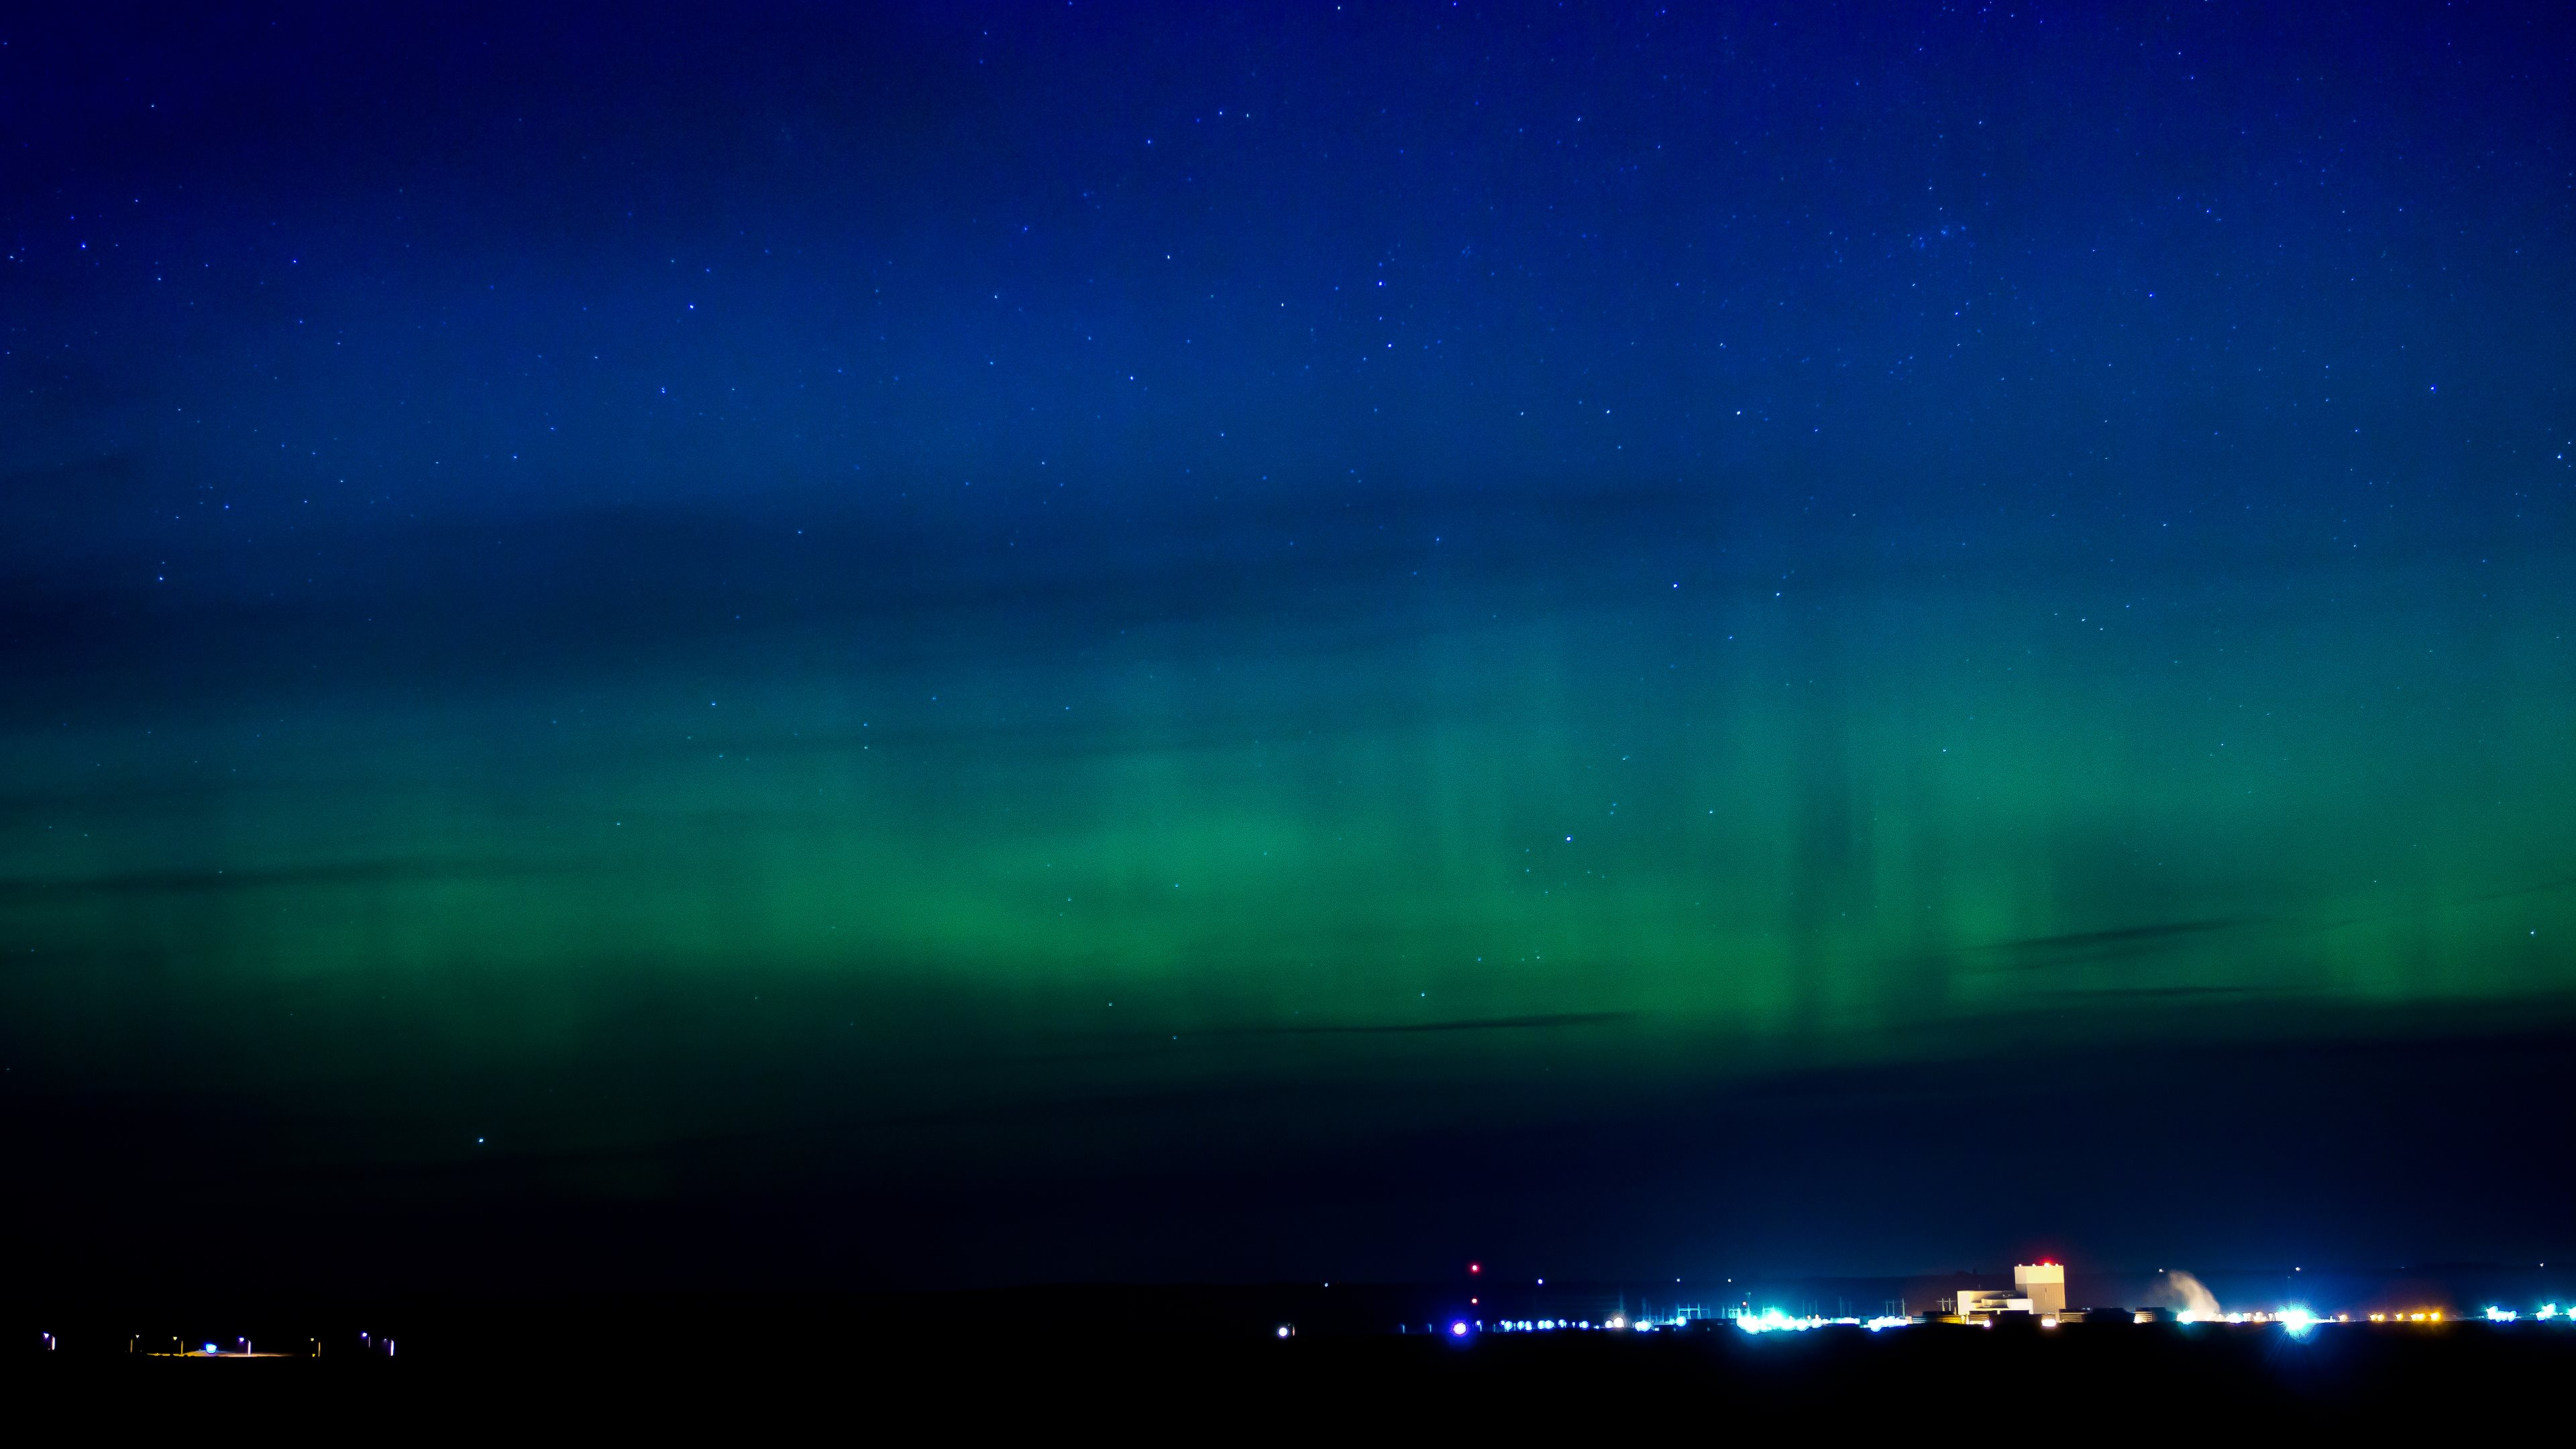 northern lights wallpaper 4k - photo #17